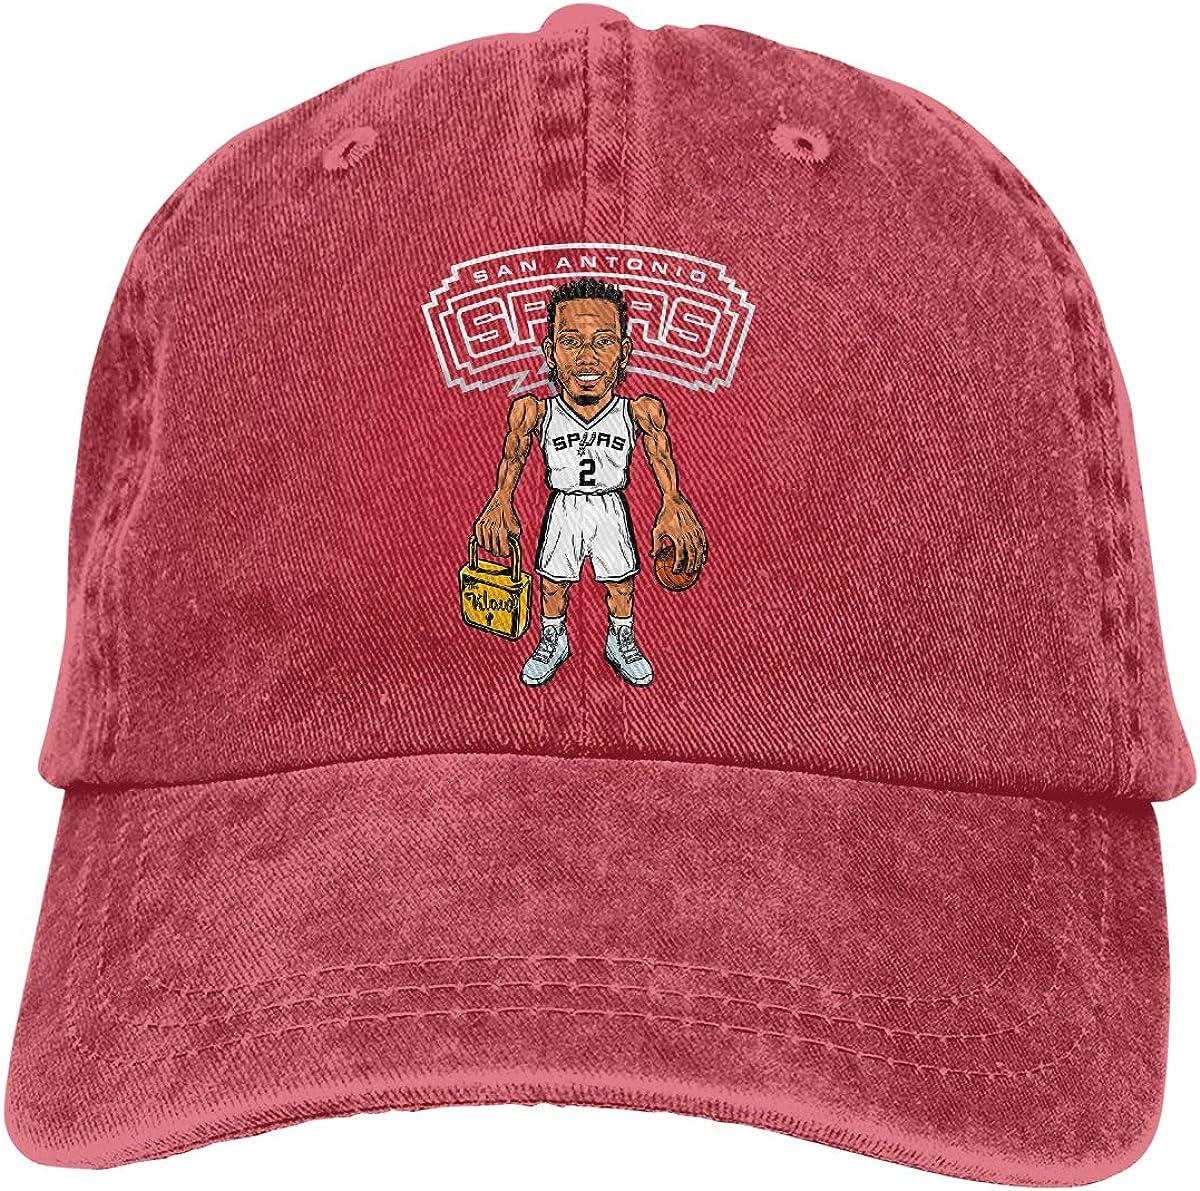 Haggai Romeo Unisex Ka-WHI Leon-ard Snapback Baseball Cap Flat Brim Hip Hop Hat Adjustable Dad Hat